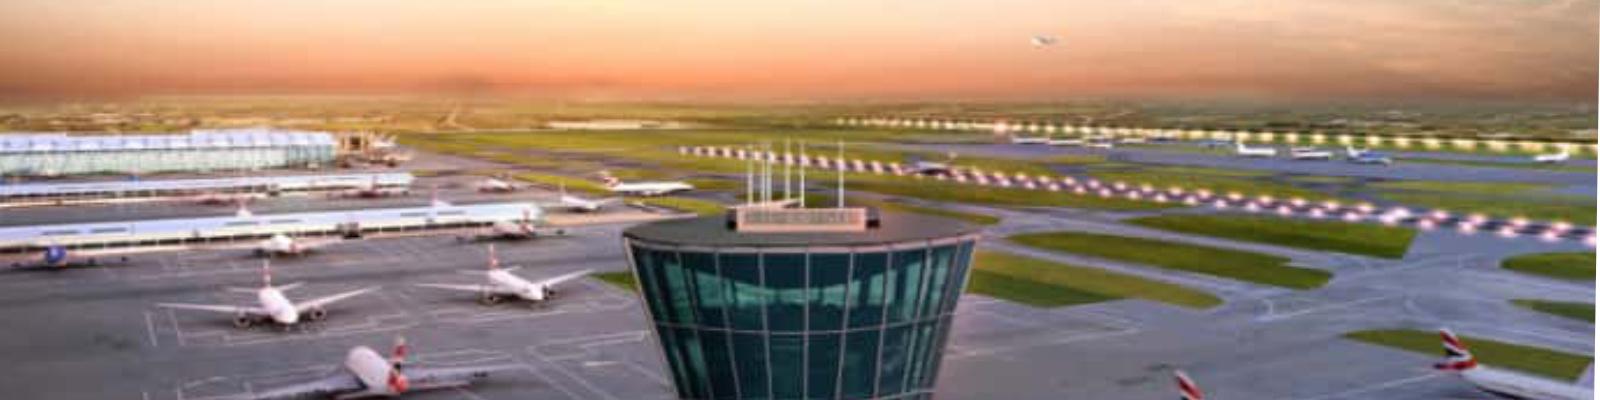 Robert Garbett's Take on Air Drone's Latest Run-in: Heathrow Airport